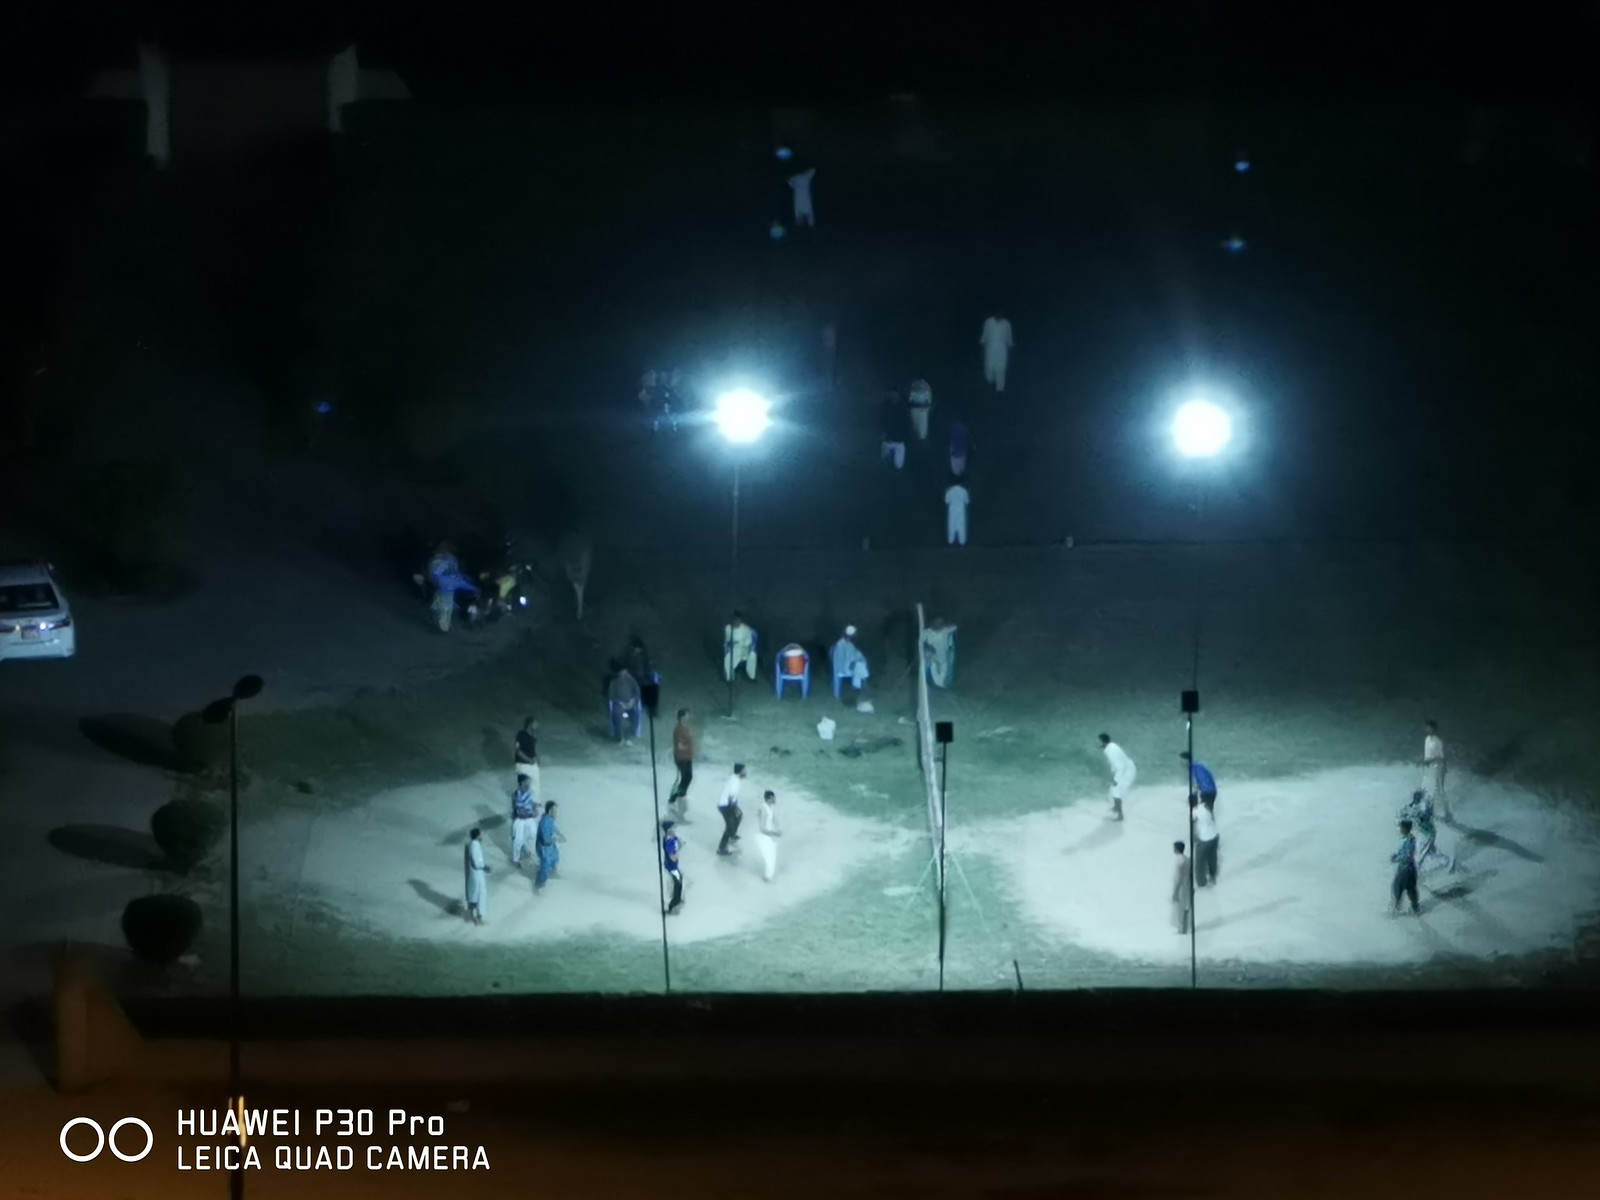 10x zoom shot on Huawei P30 Pro